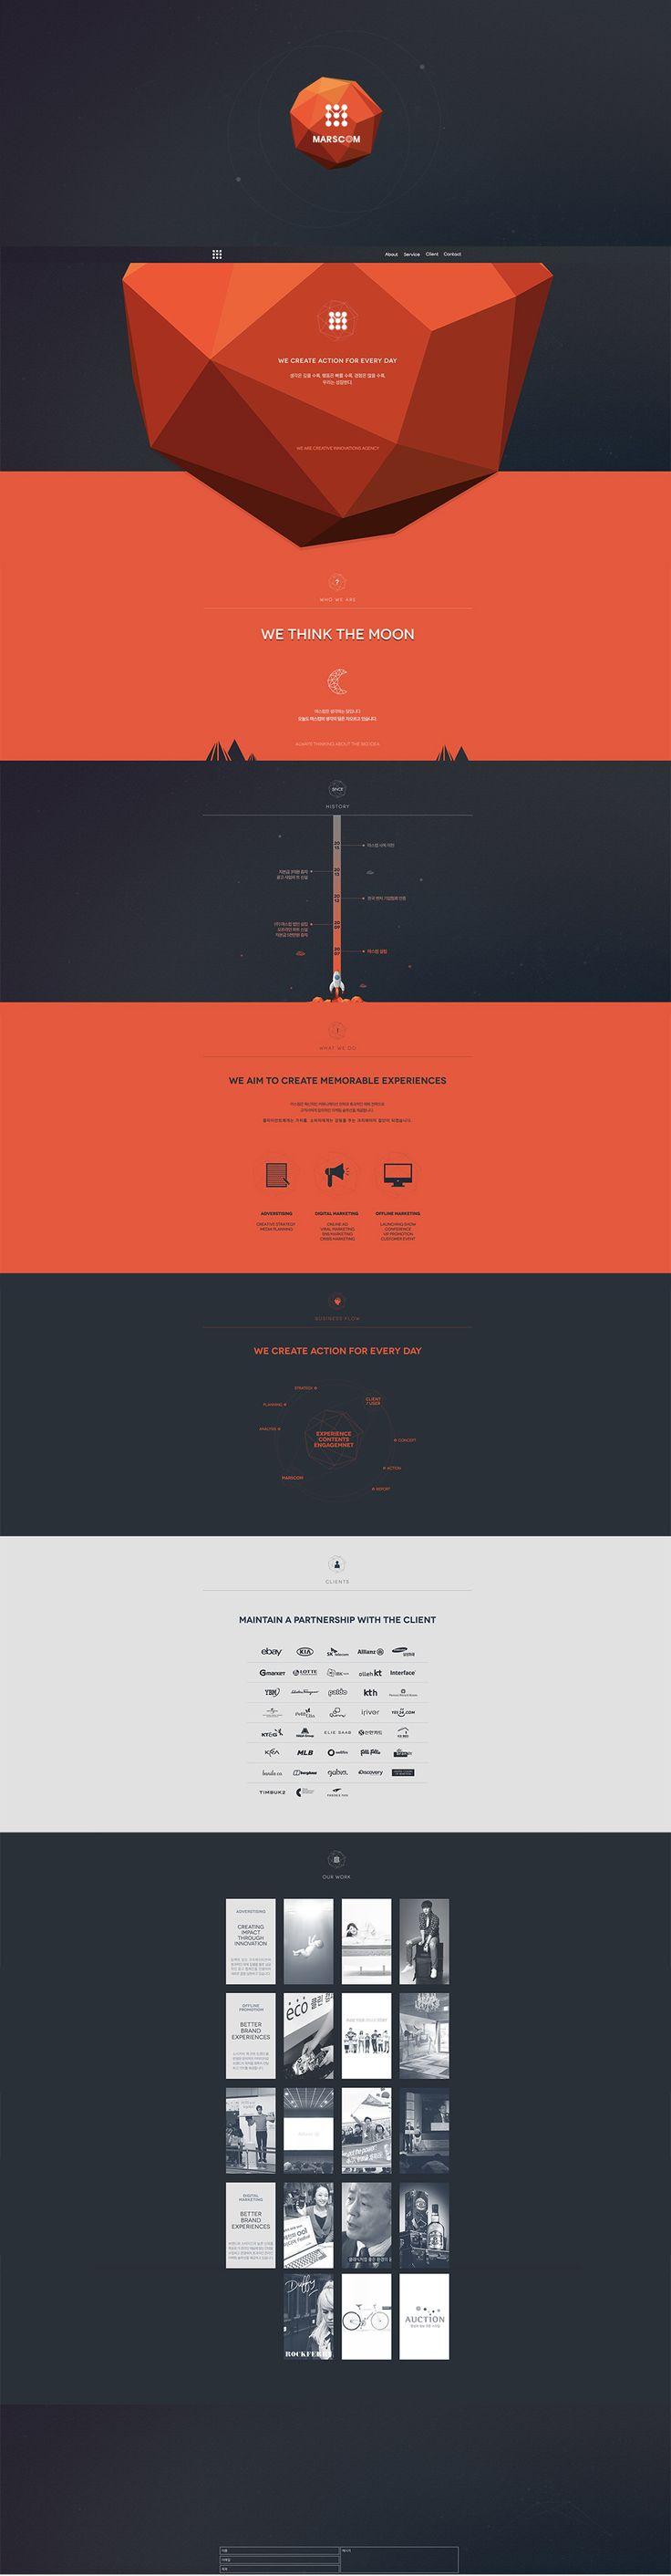 #wix #webdesign #web #design #디자인 #웹디자인 #회사홈페이지 #homepage